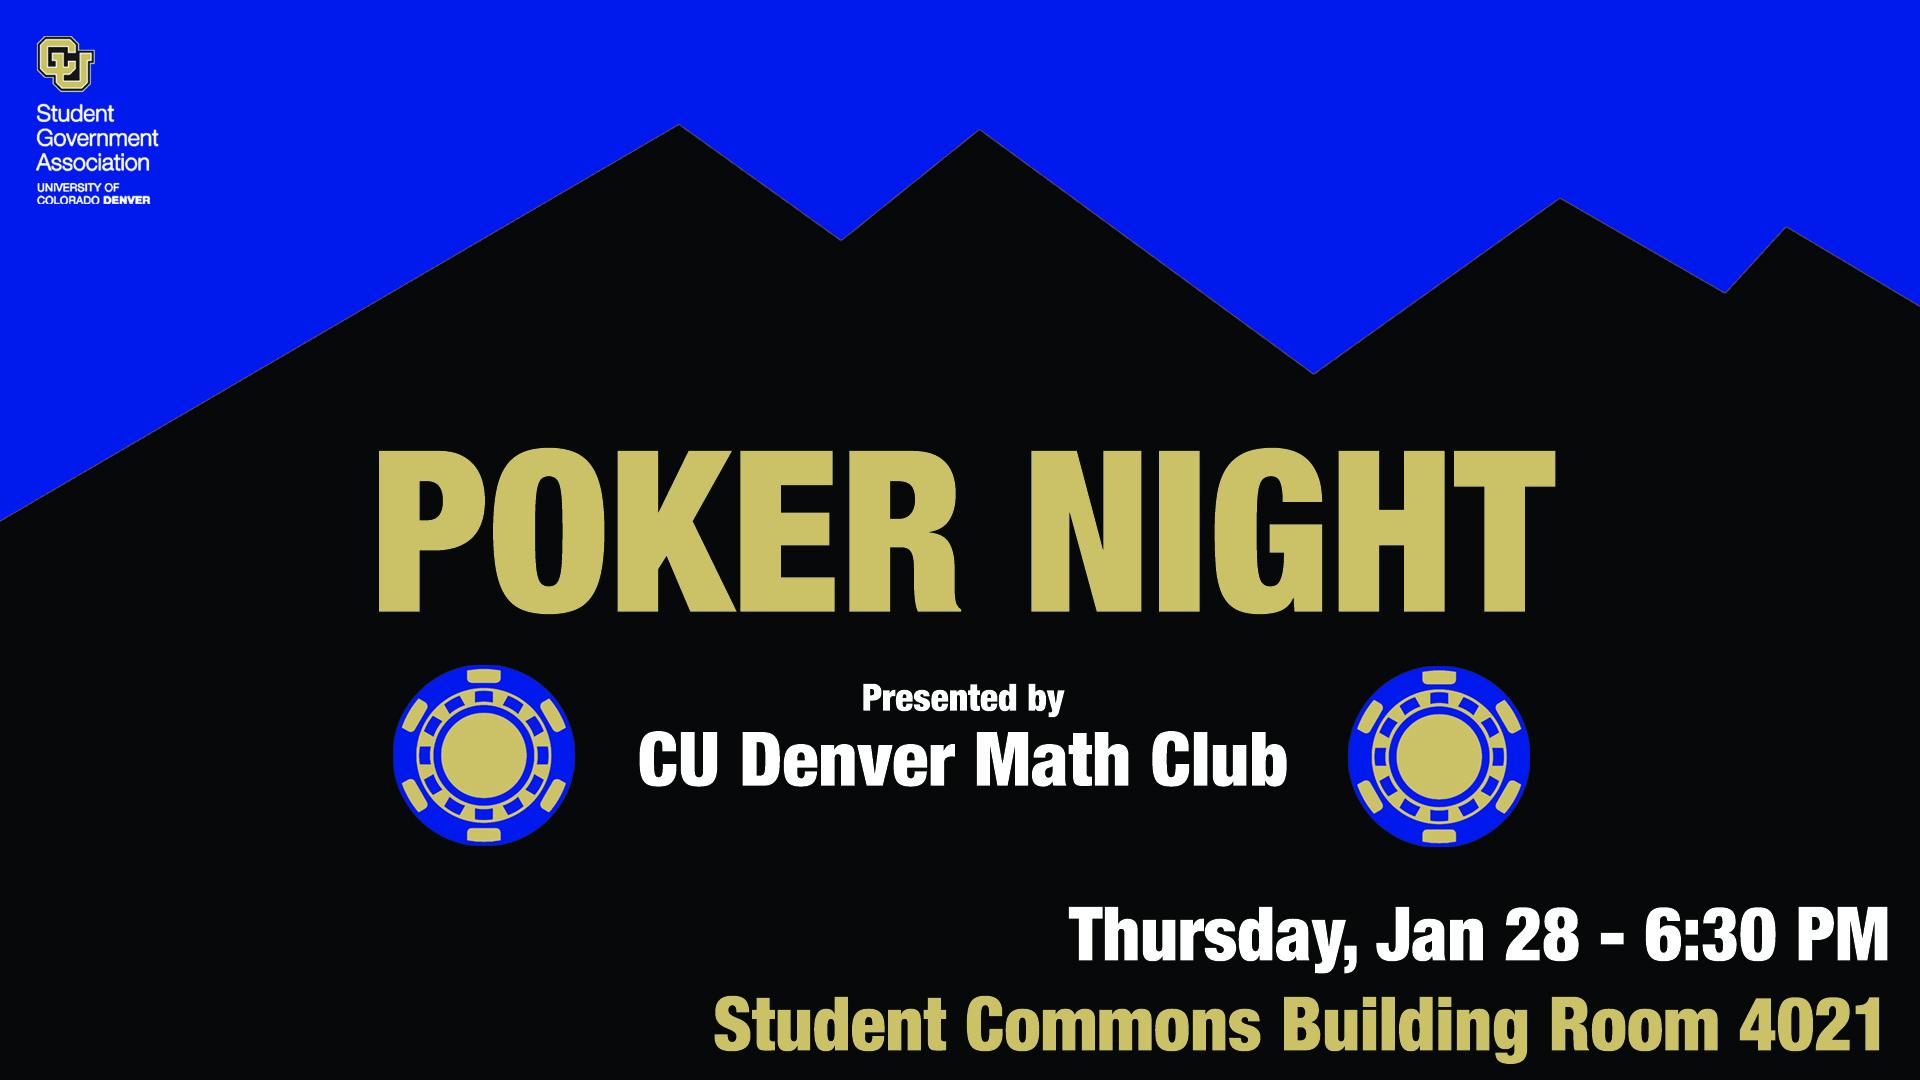 Poker Night Poster.jpg